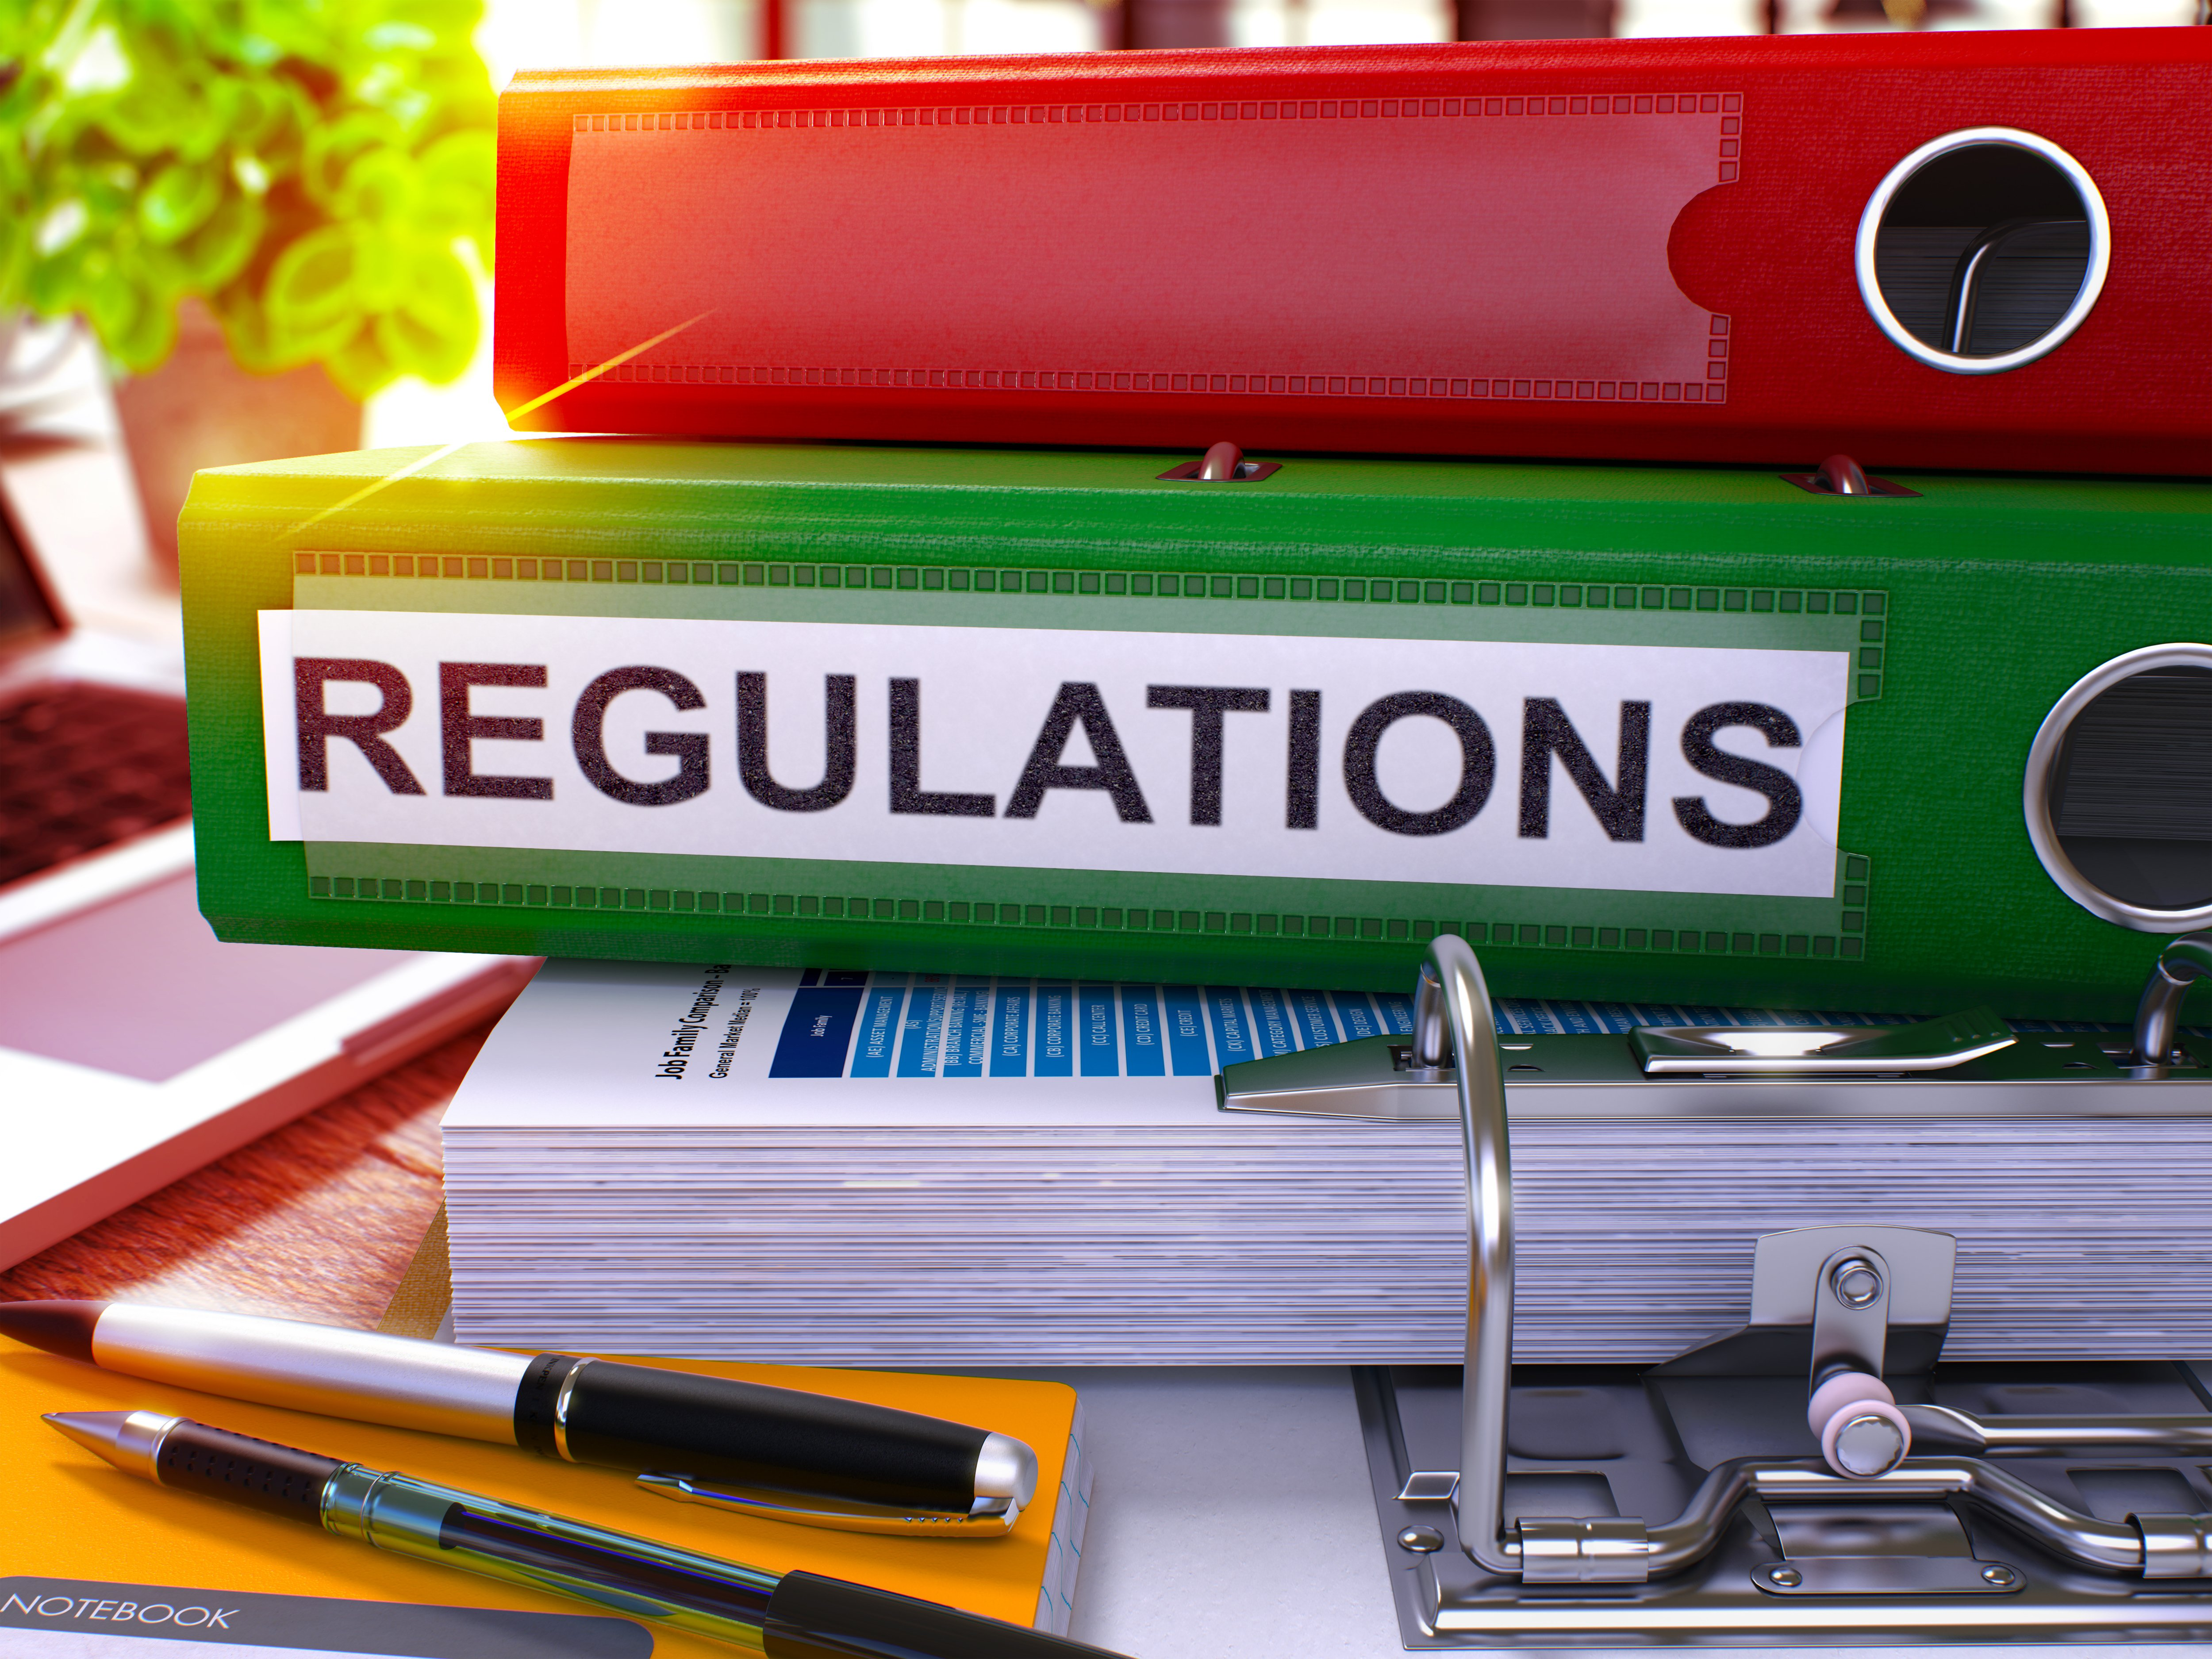 green regulations folder on desk